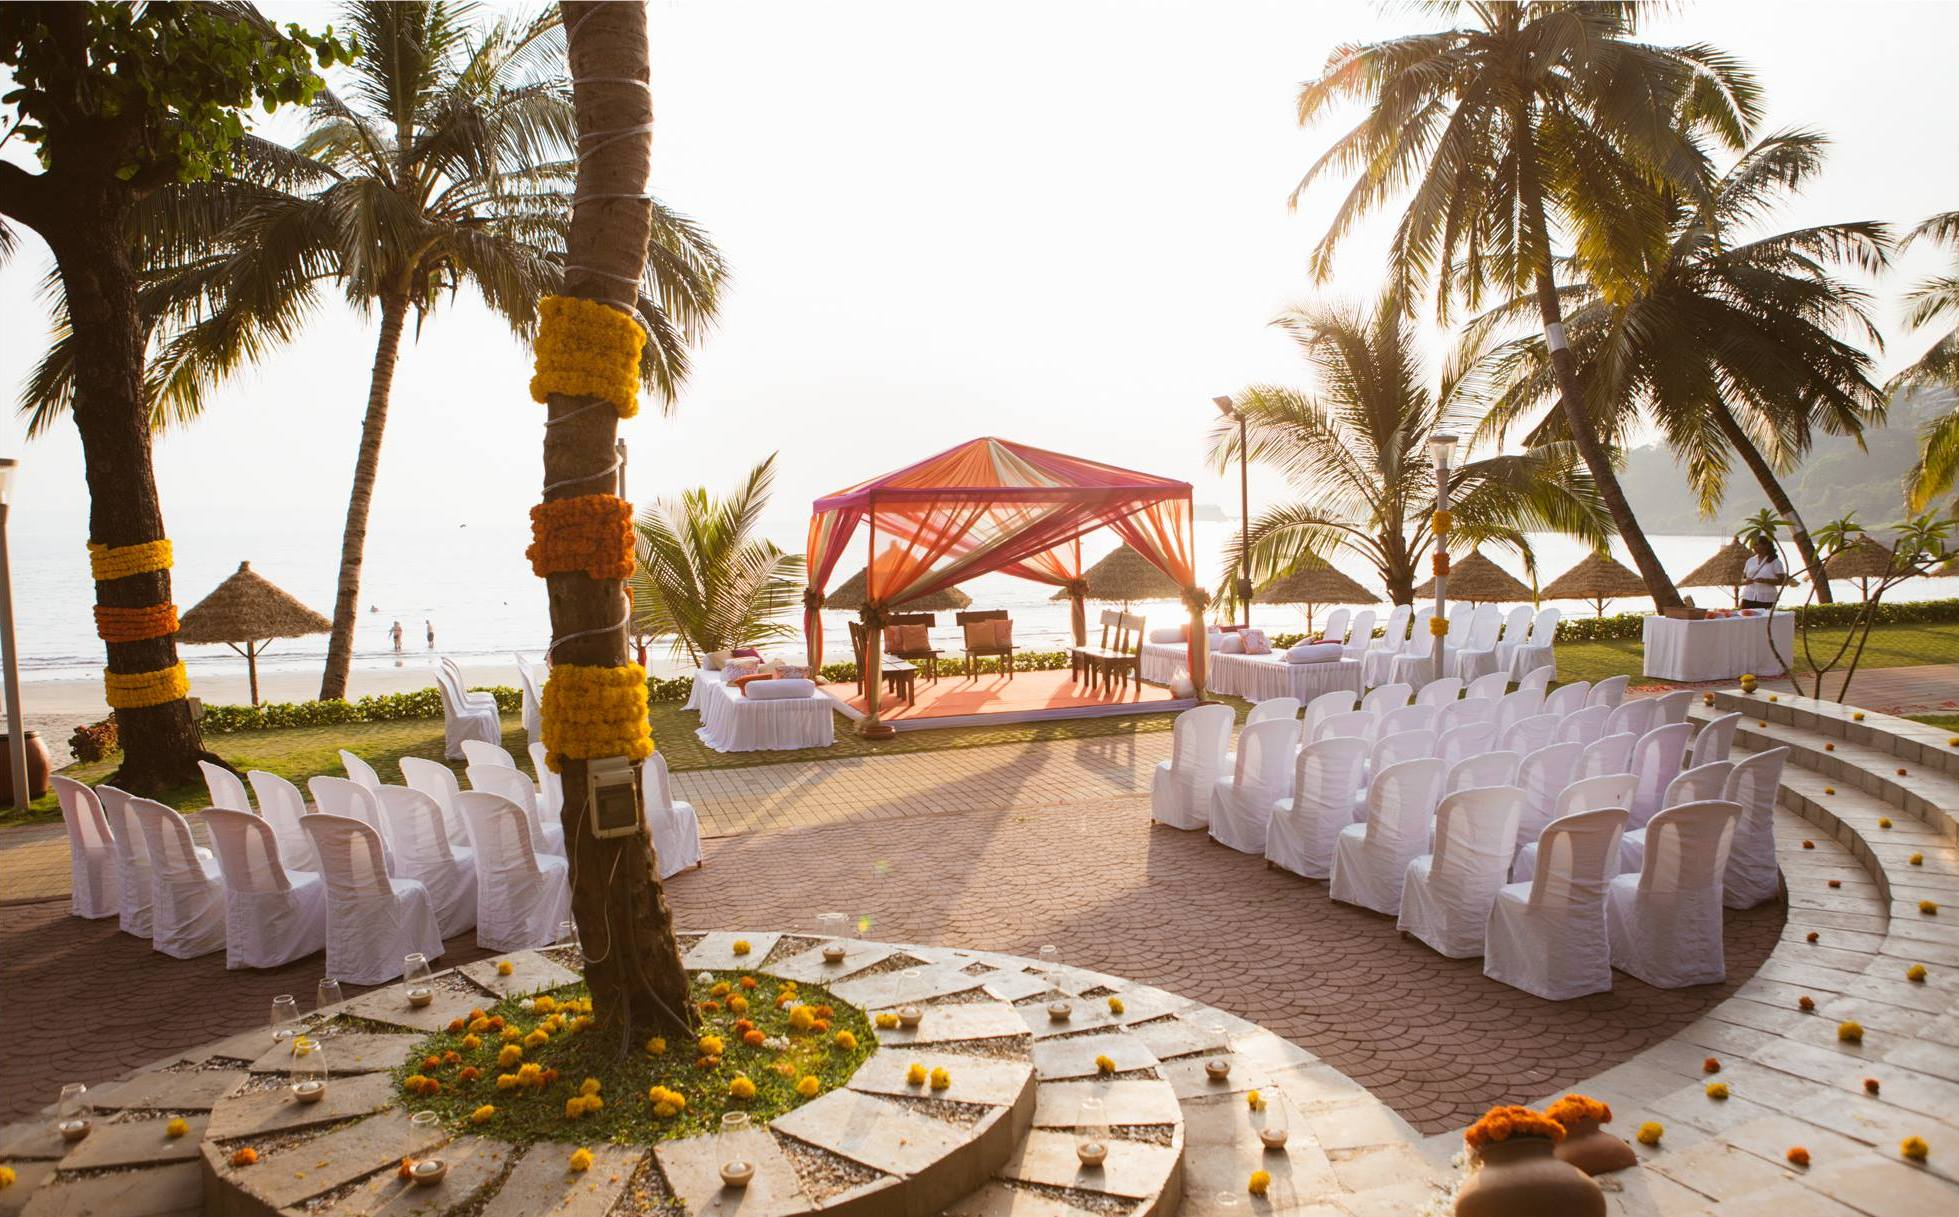 Top Beach Vacation Destination - Goa Beach Resorts